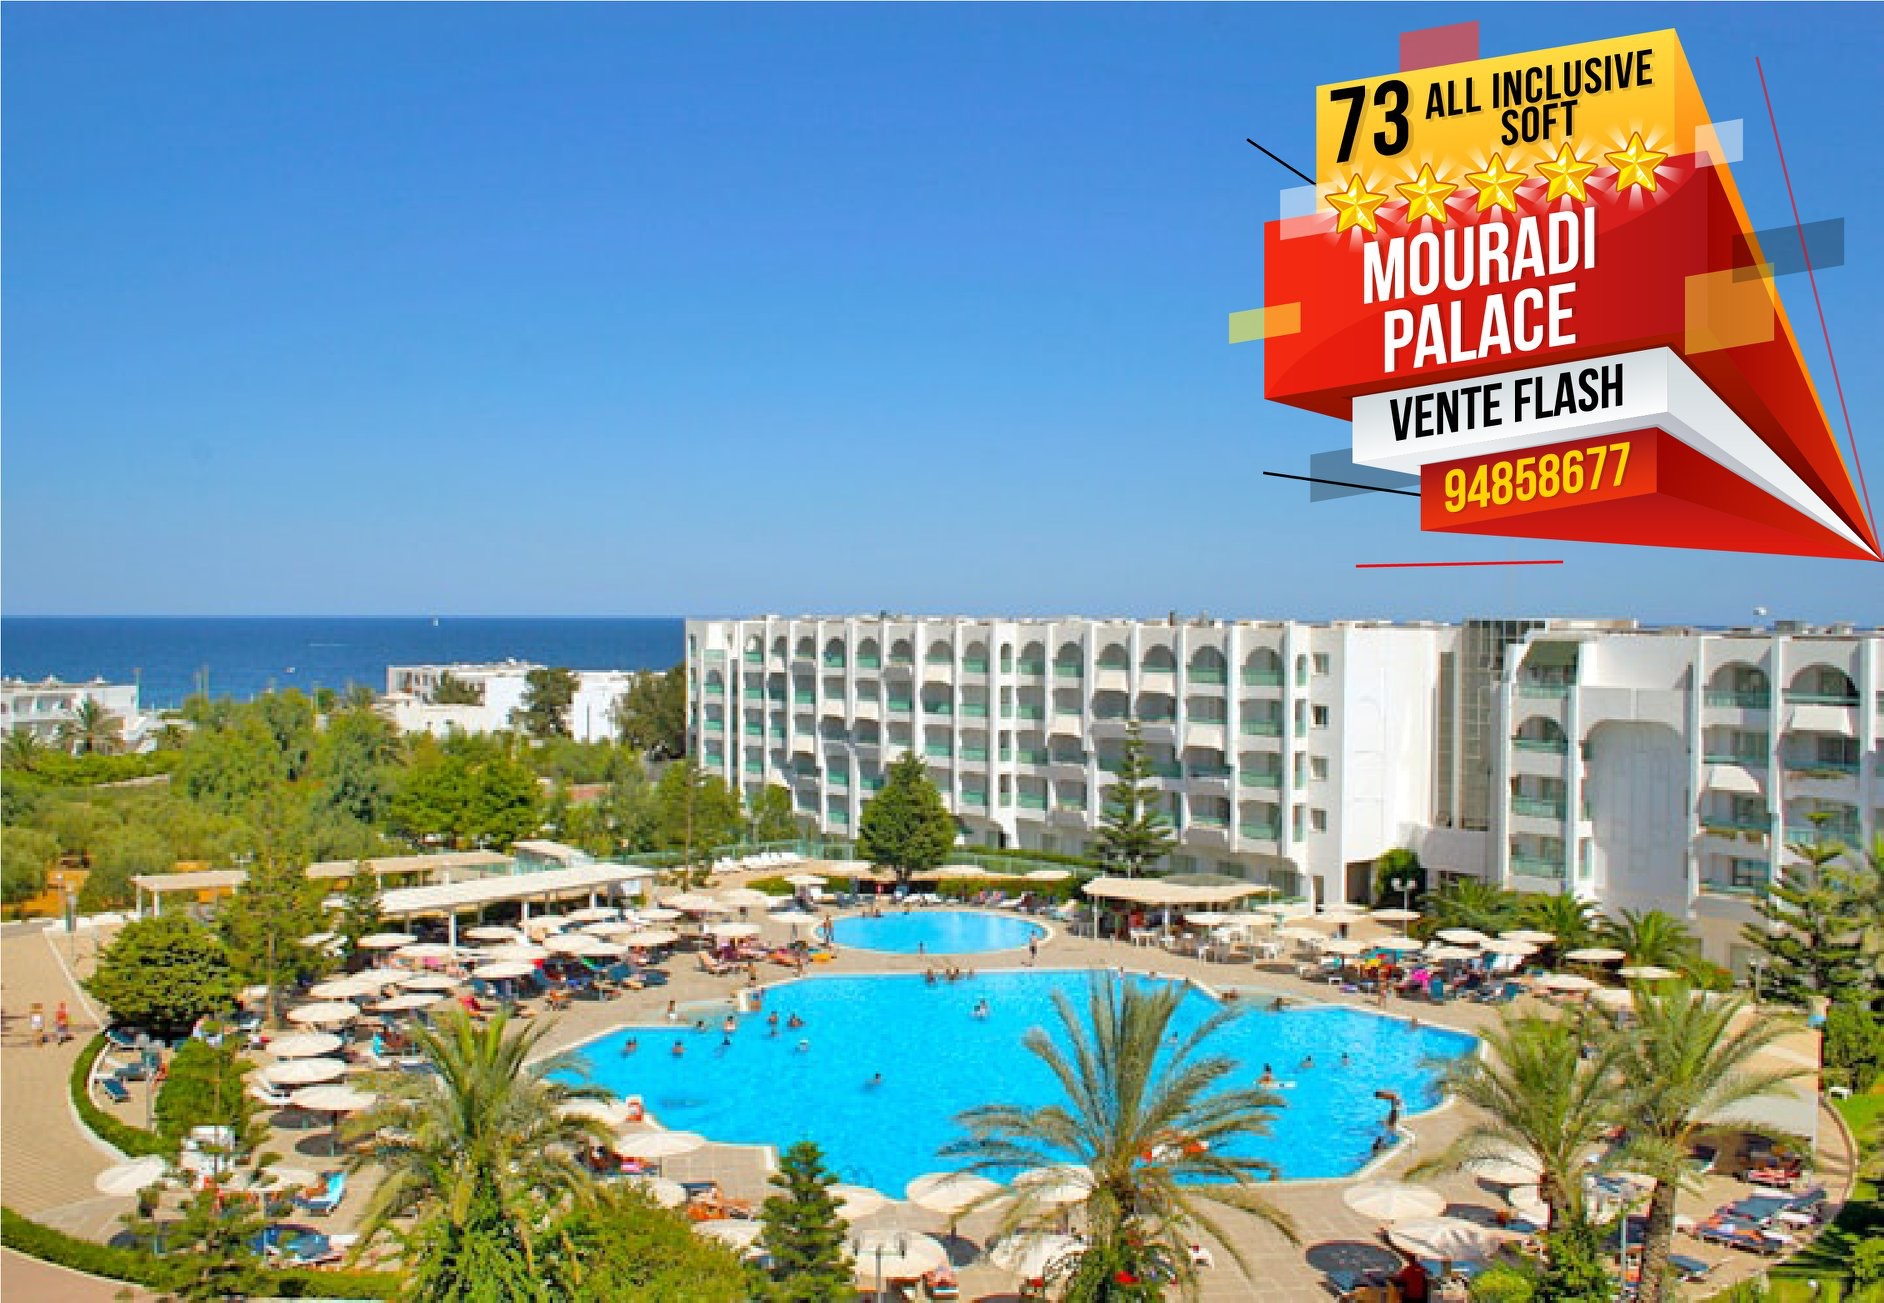 ⏰🎉 VENTE FLASH 🎊📢 🎆 Hôtel Mouradi Palace 5 * ⭐⭐⭐⭐⭐ -Port Kantaoui Sousse-